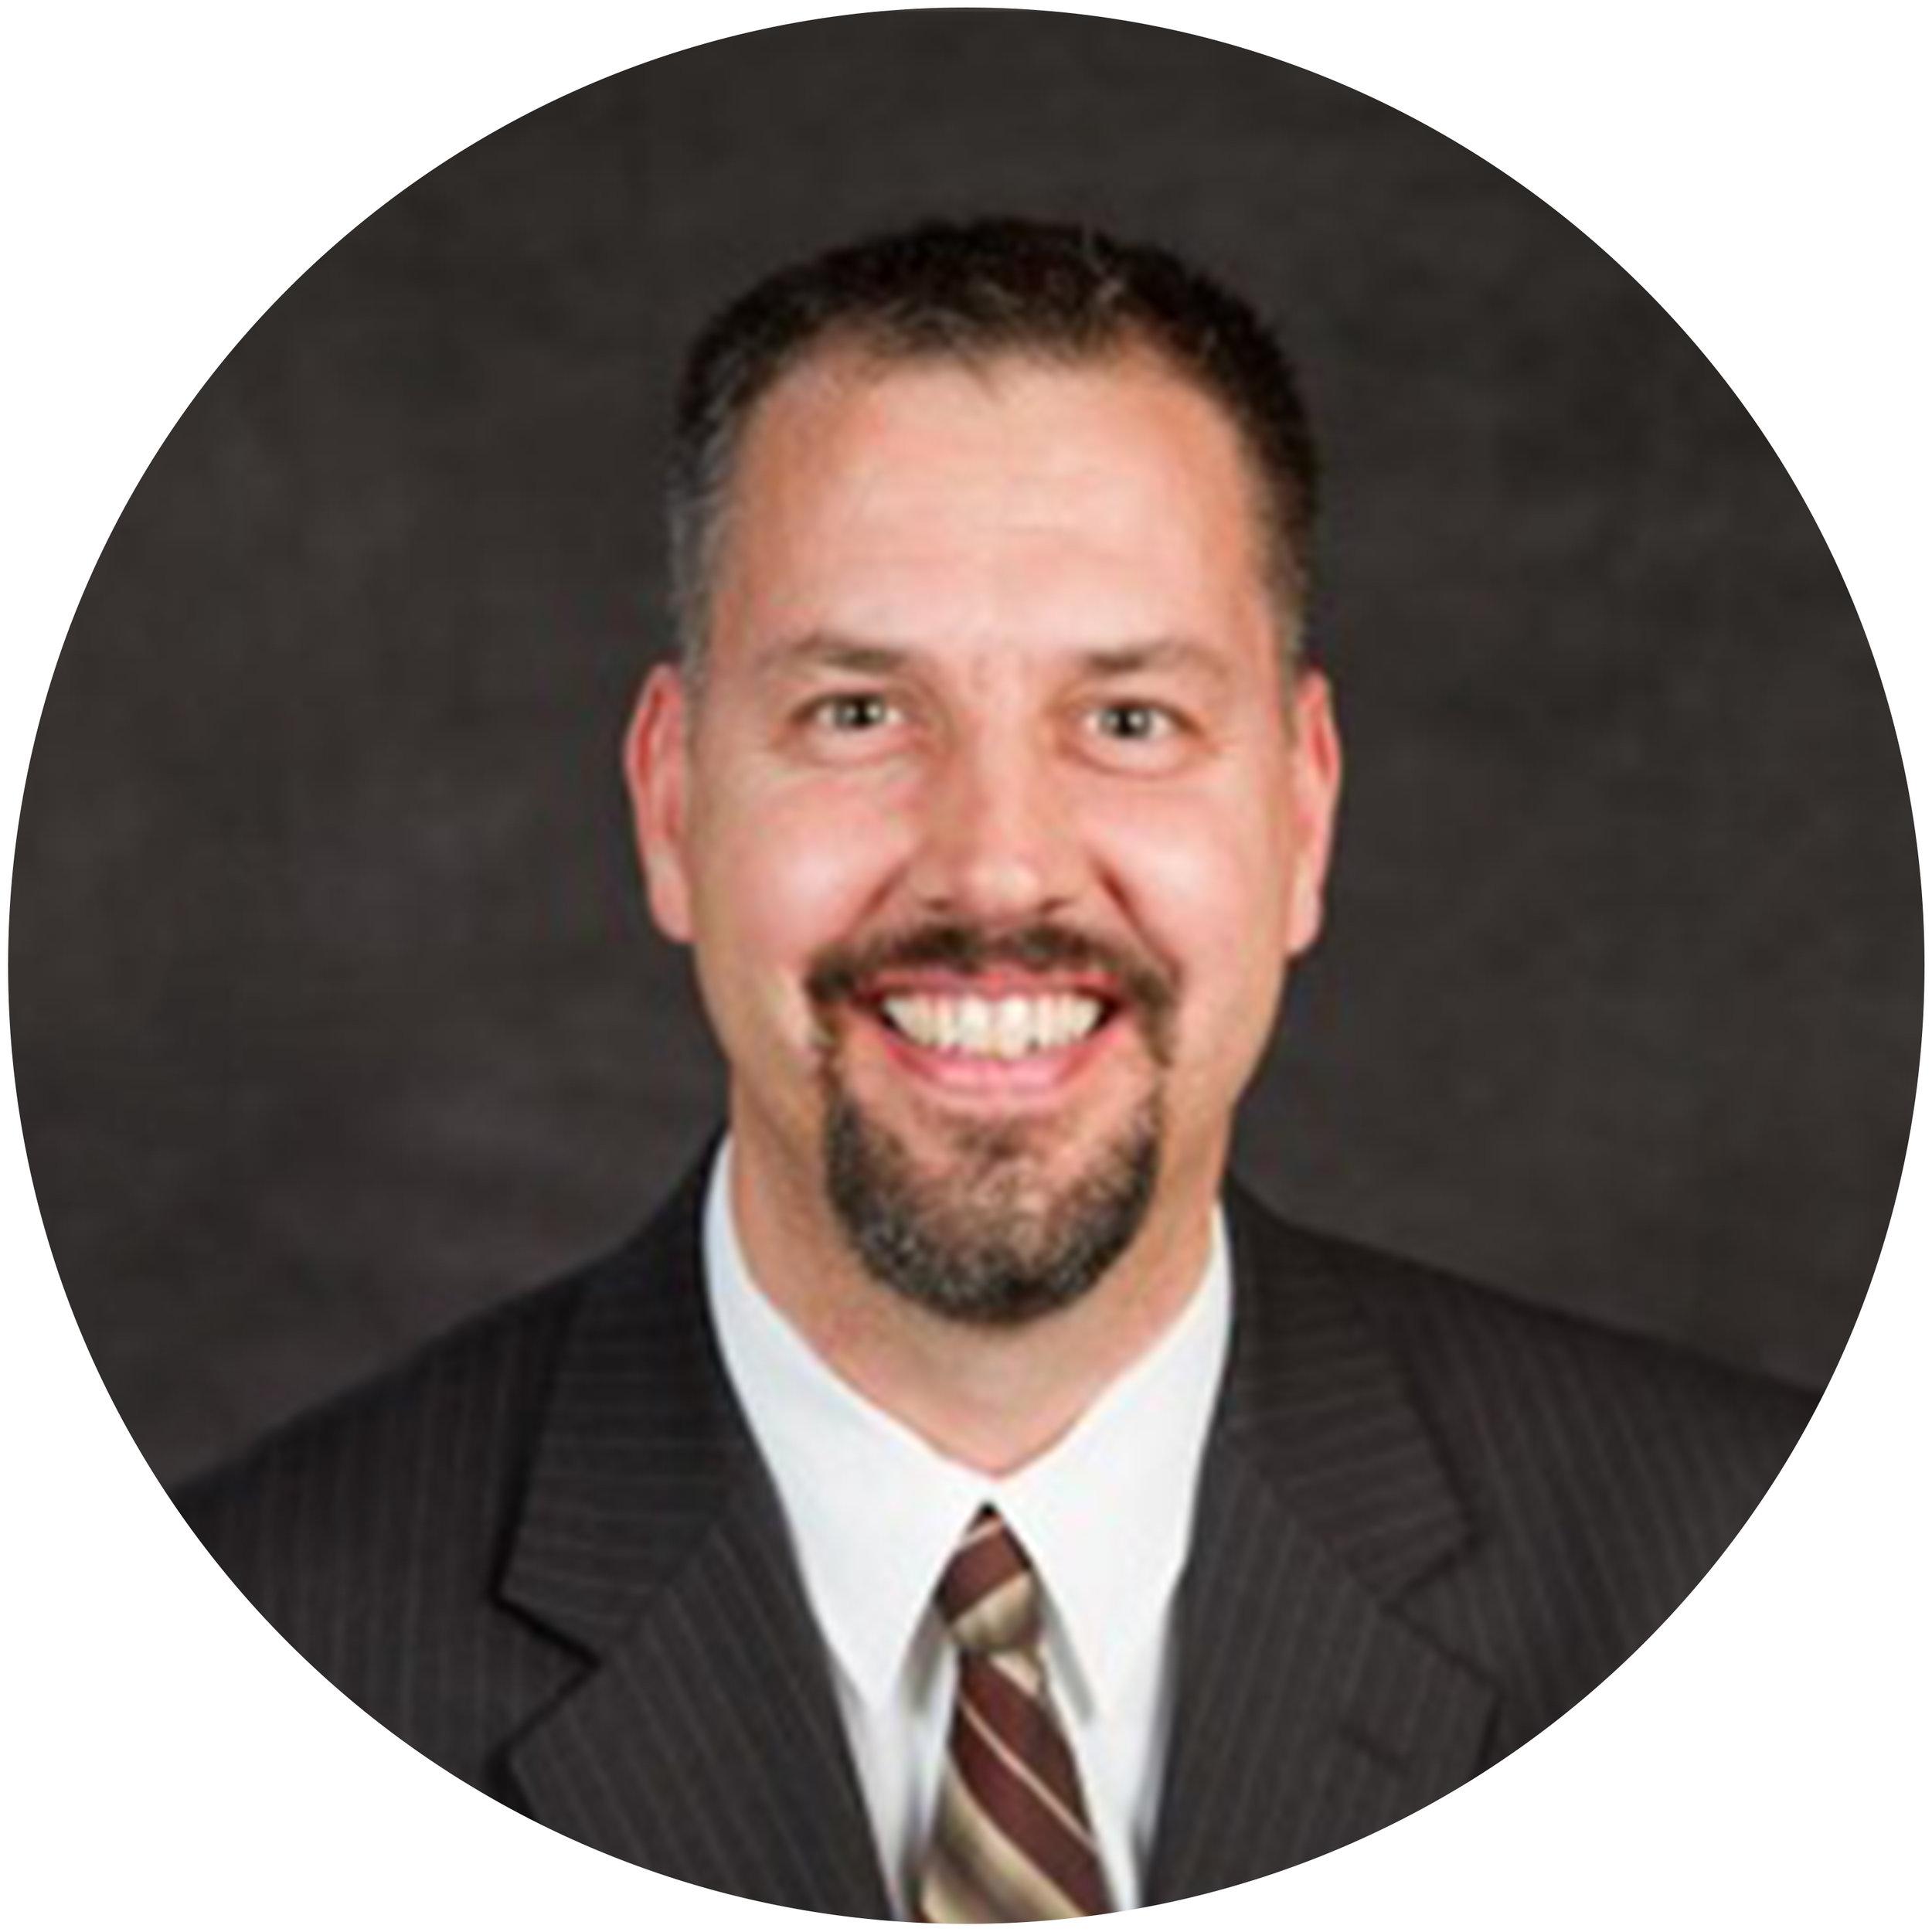 Chris Jaros, P.E., Vice President, Land Services Division, KERAMIDA Inc.